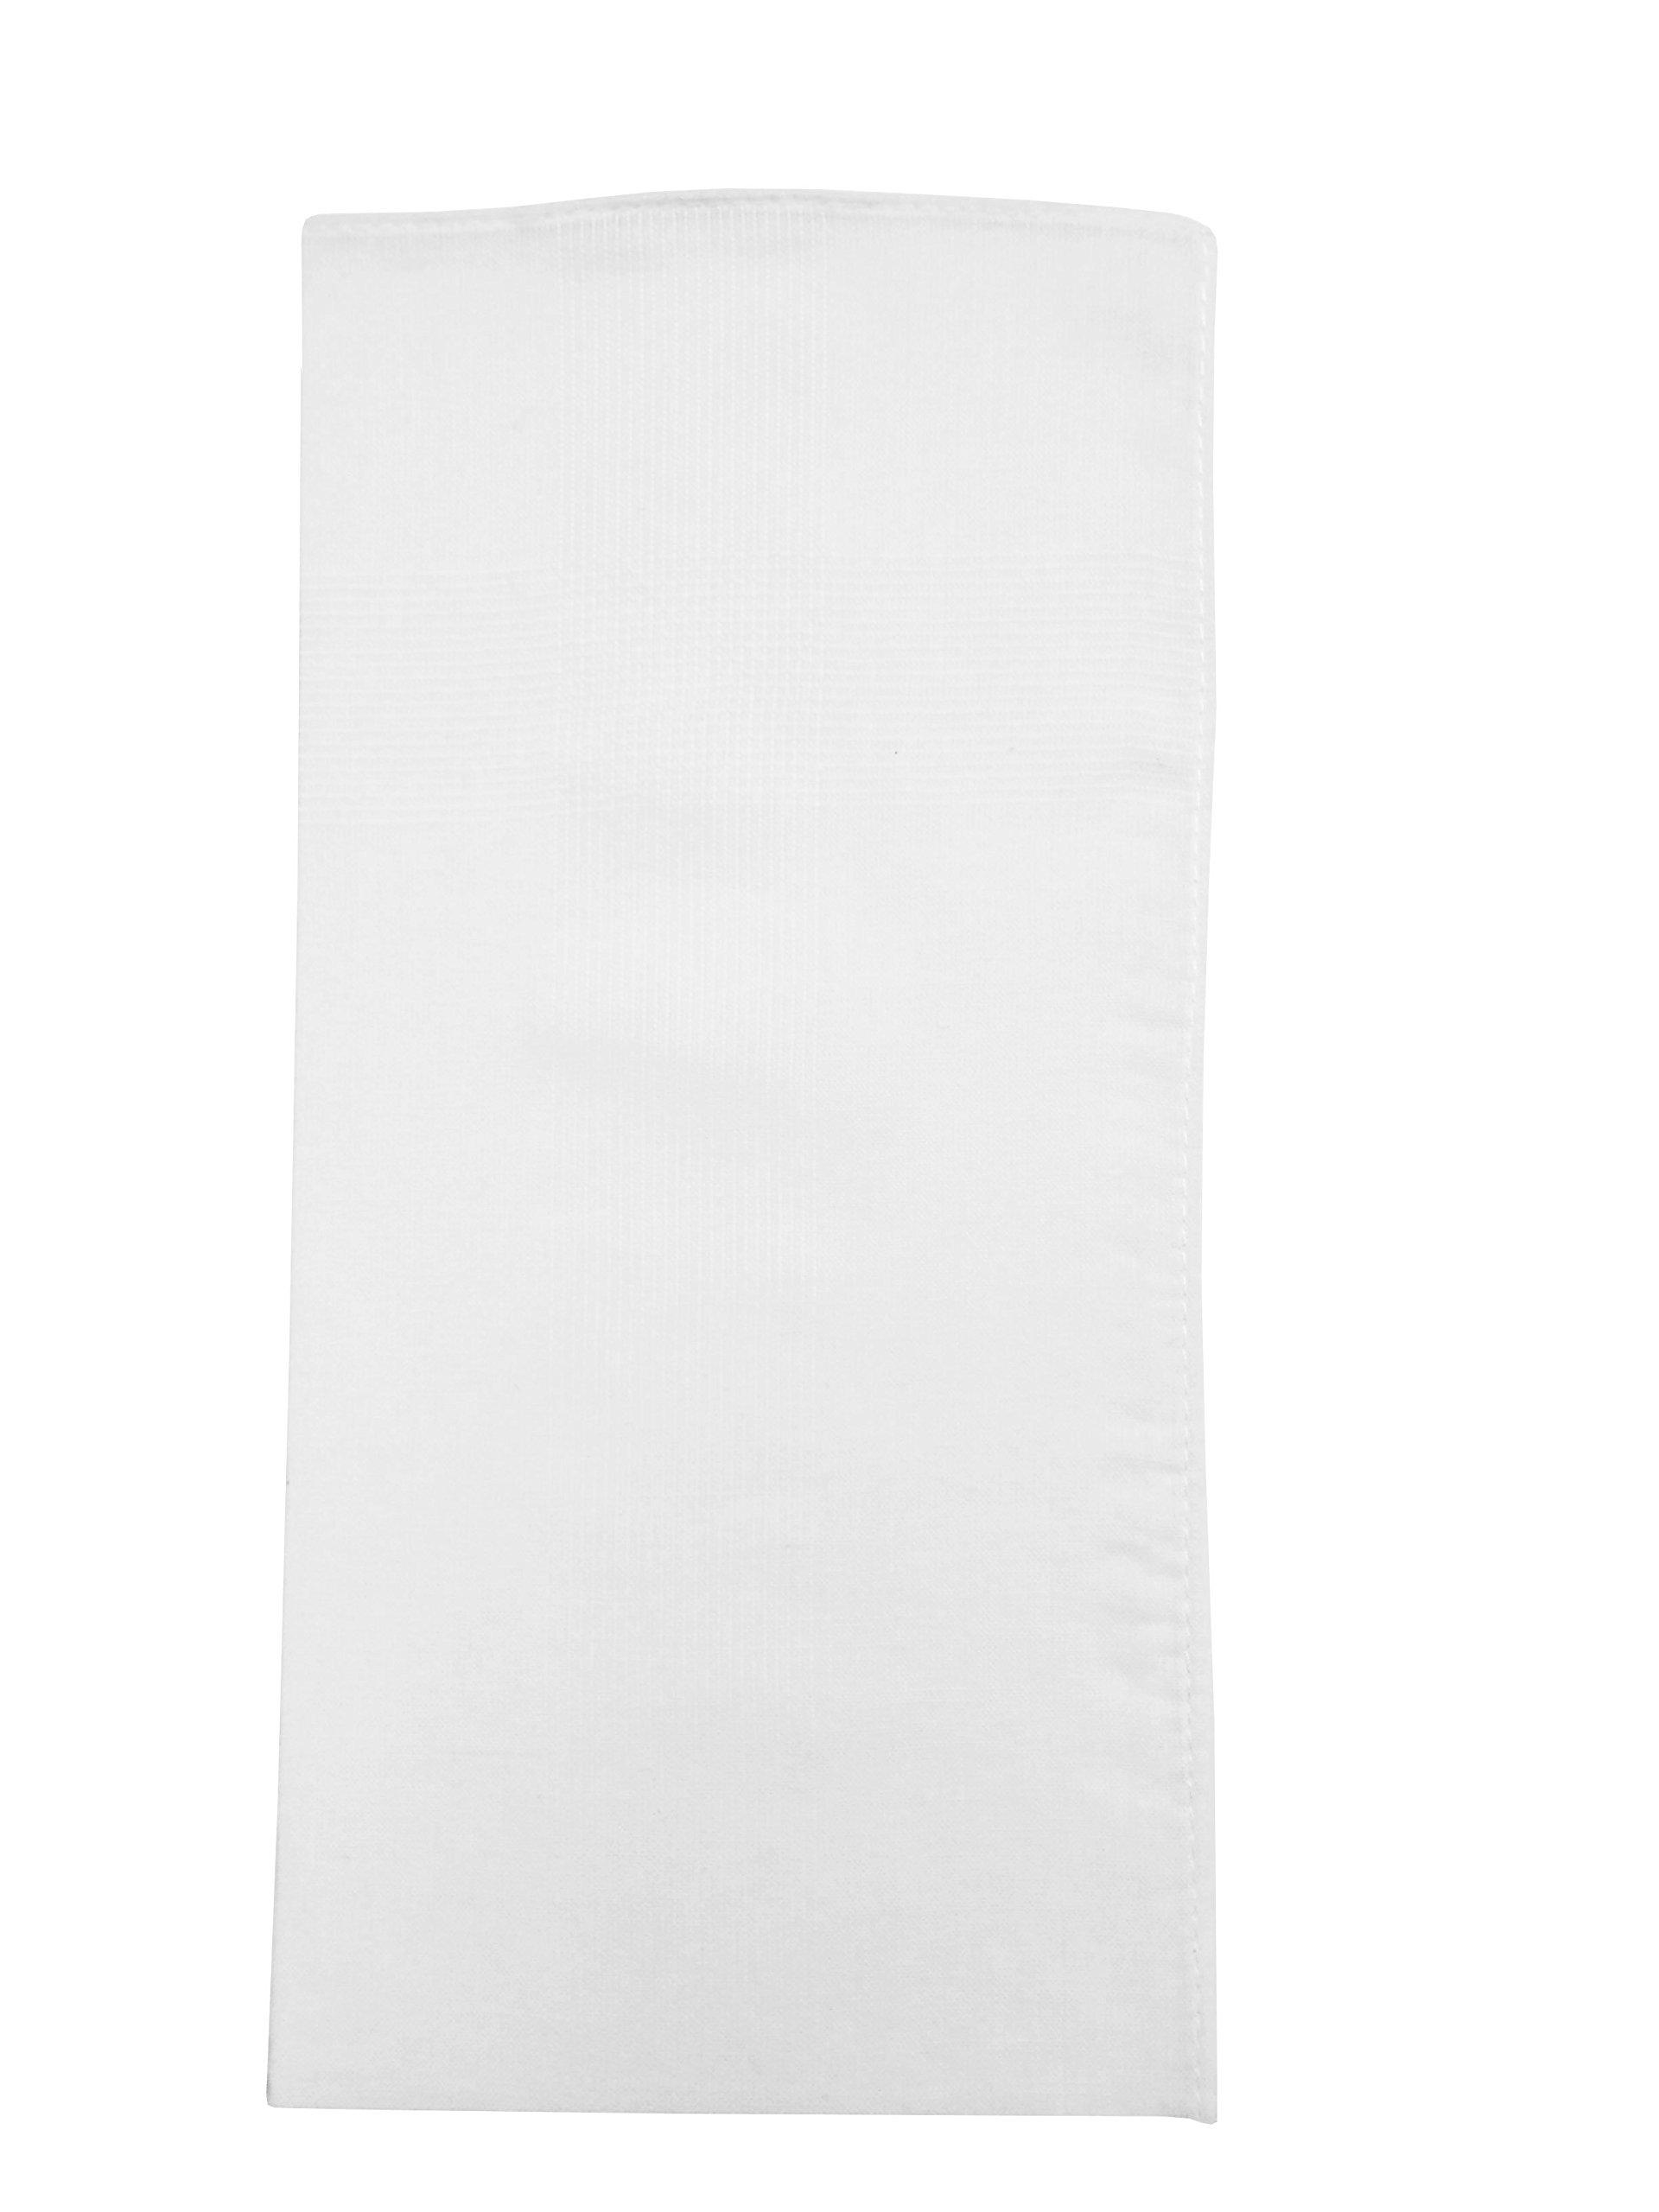 Imperial 13 Pack Men's Fine Handkerchiefs 65% Polyester 35% Cotton (White)